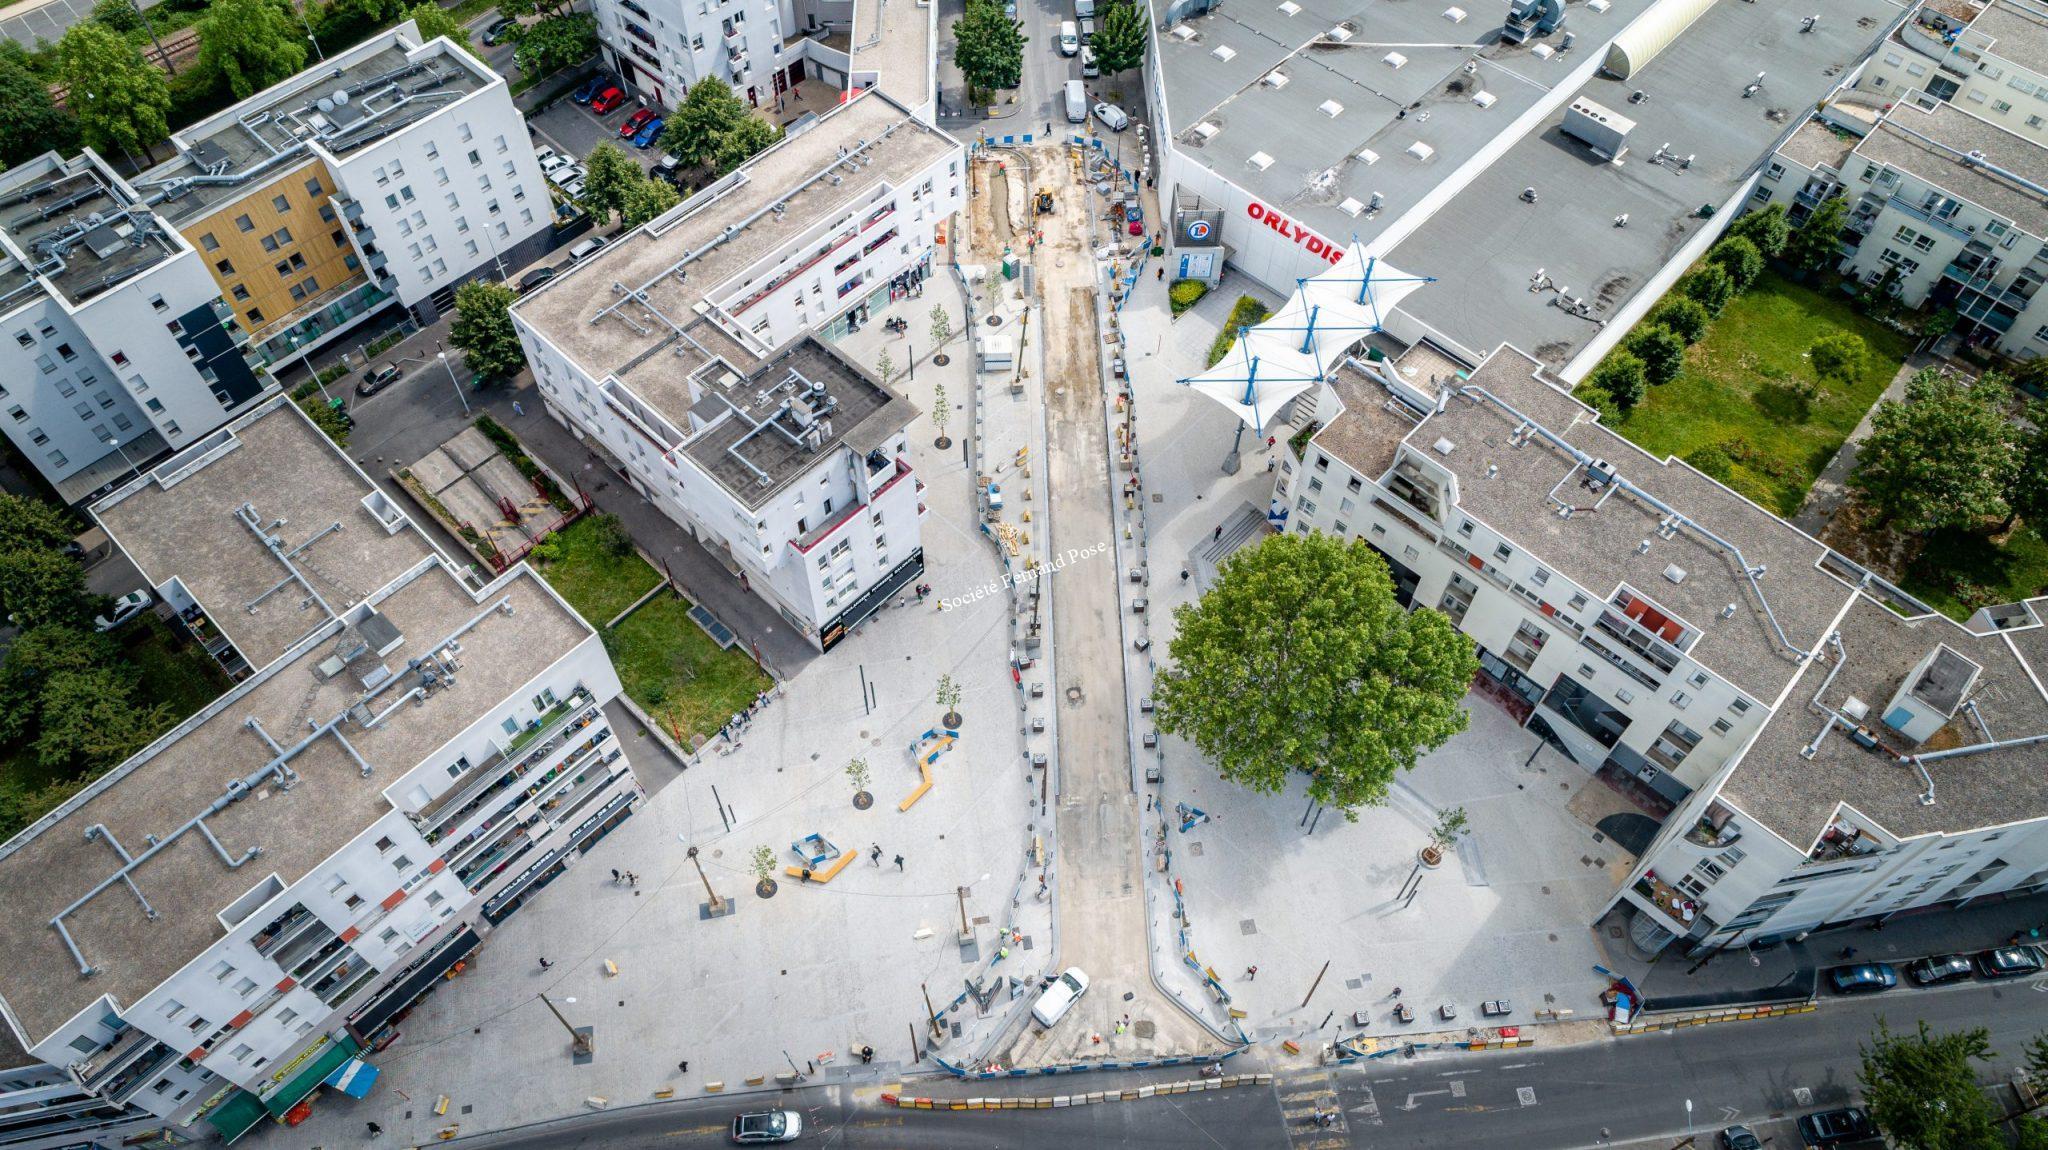 Fernand_Pose_Tram-drone-3